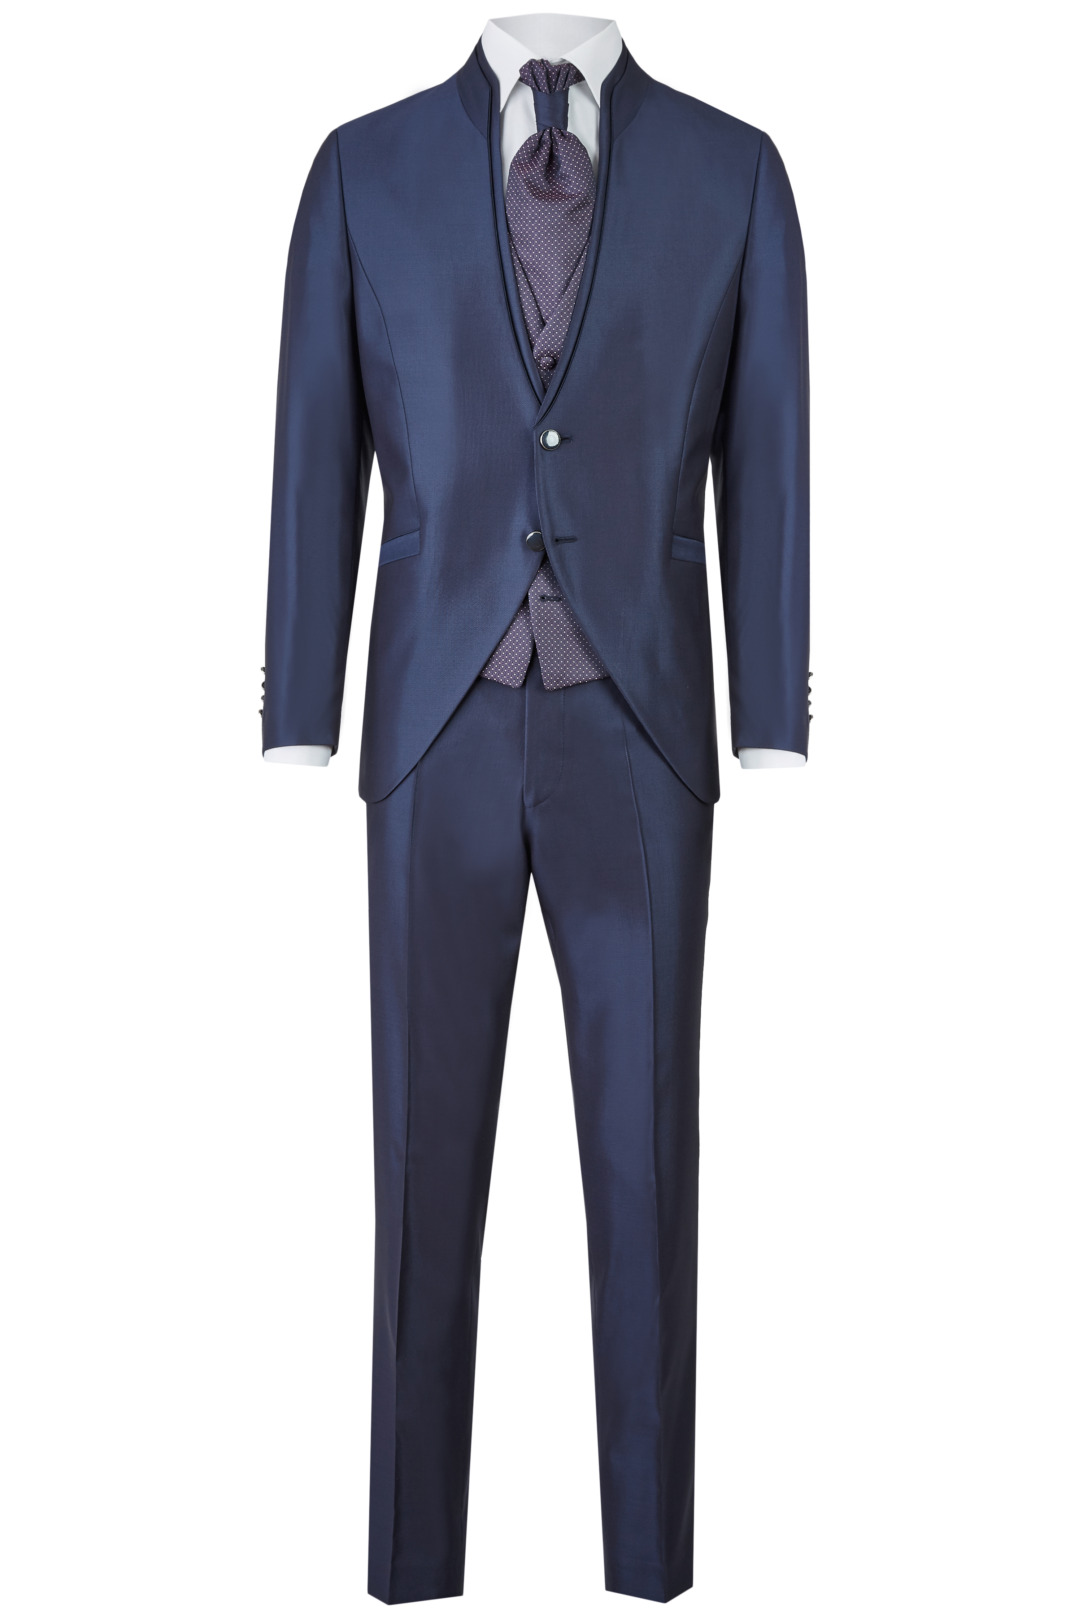 Wilvorst After Six Hochzeitsanzug Männer Mode Bräutigam klassische Form blau wil_0121_otf_as-look-1_1